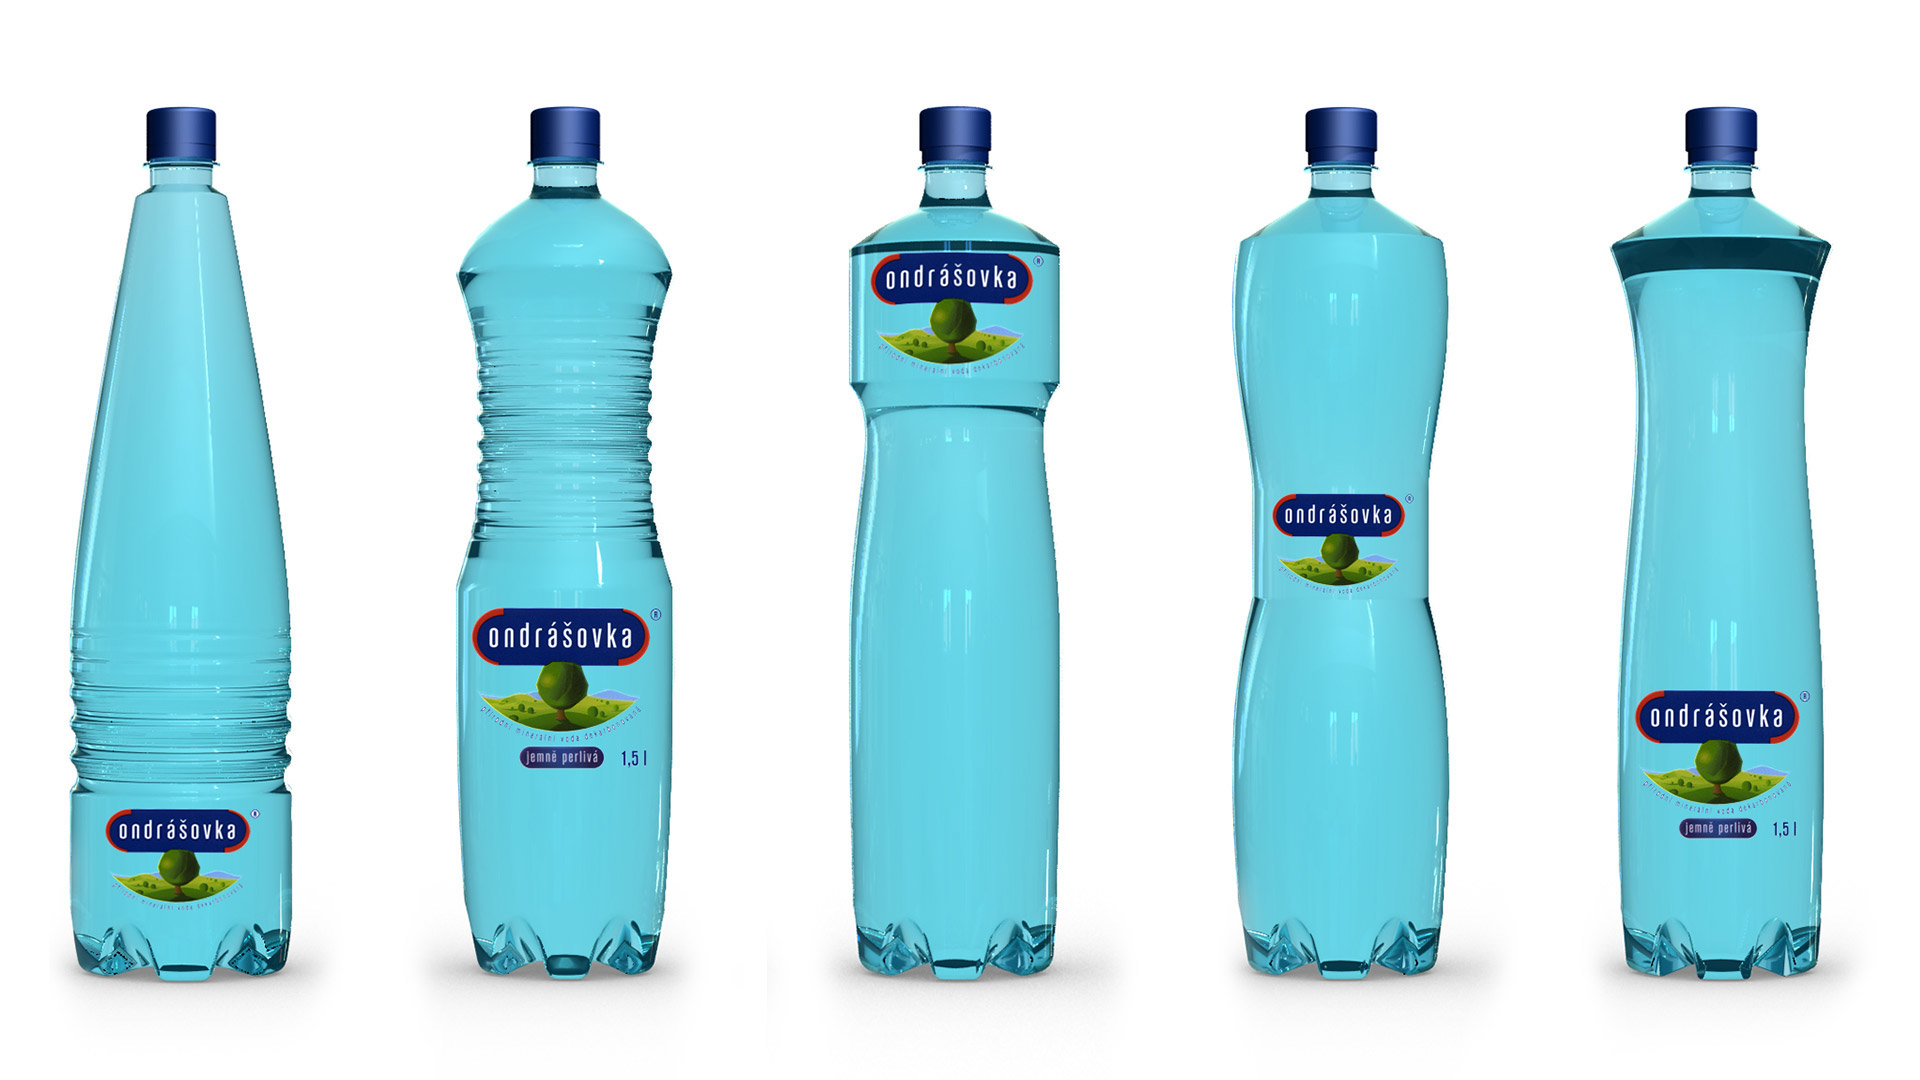 antonio meze product design and development ondrasovka water bottle